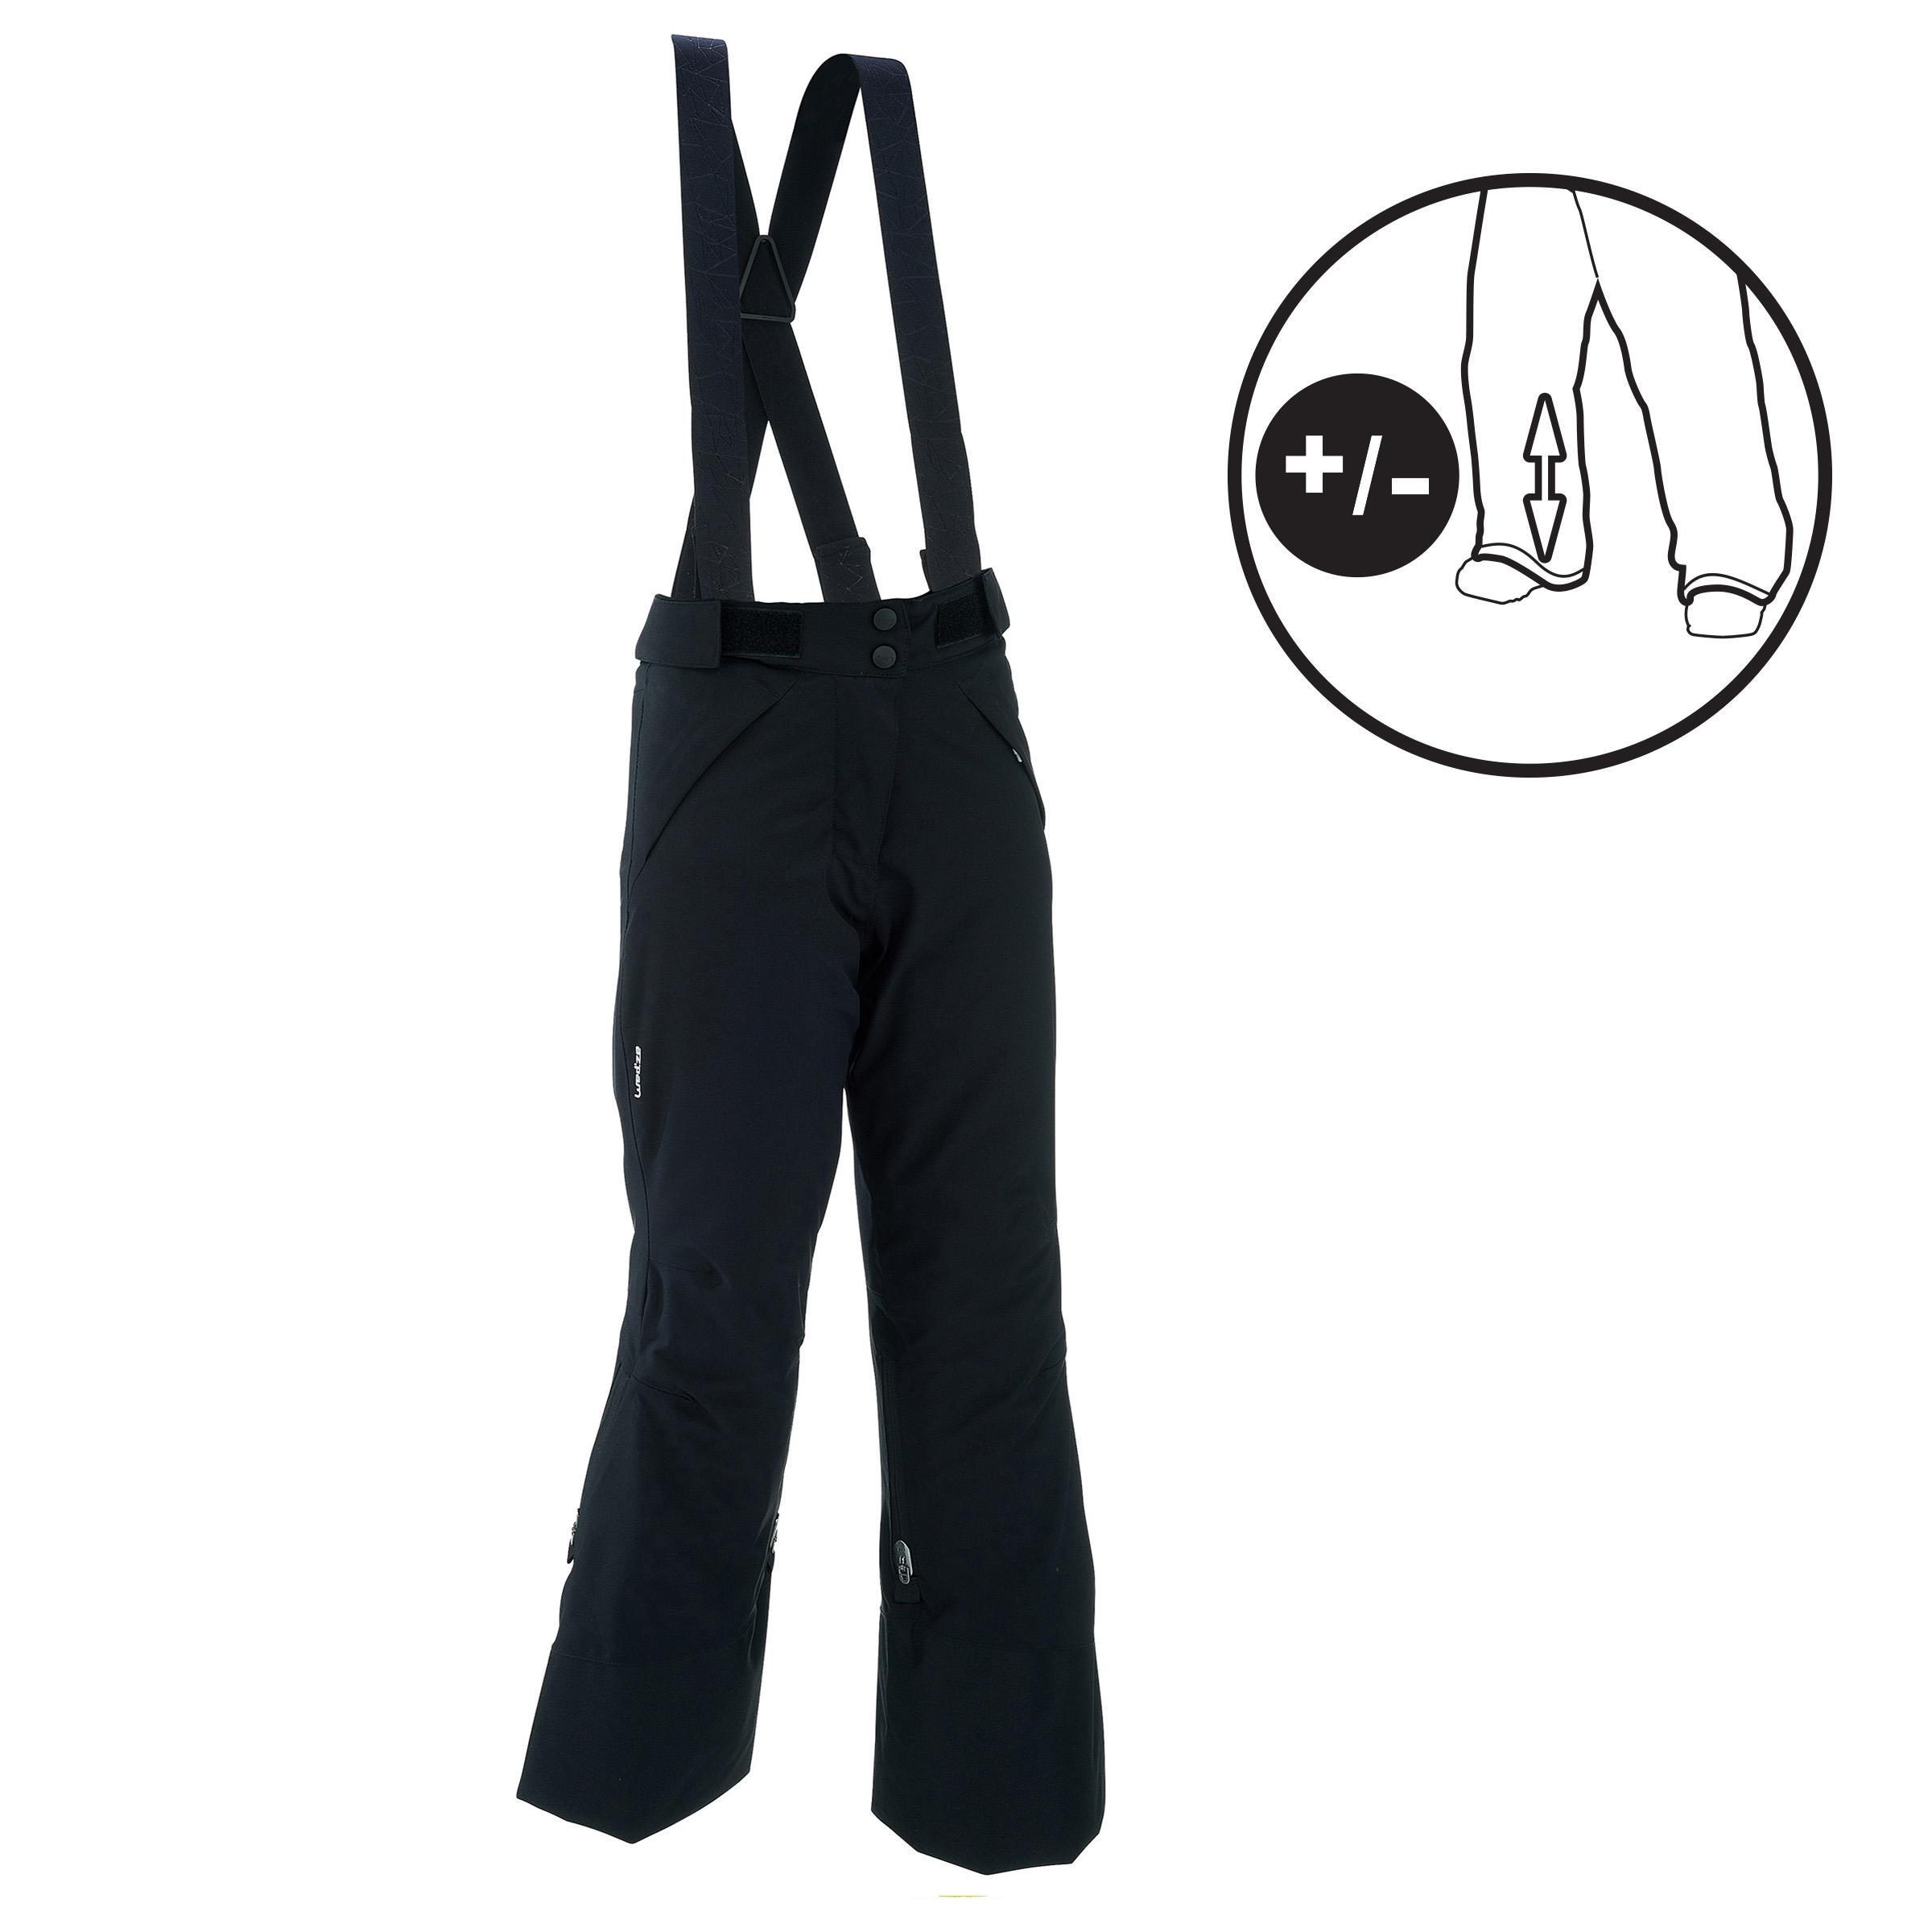 Comprar Pantalones de Nieve para Niños online  f3fd83055e74